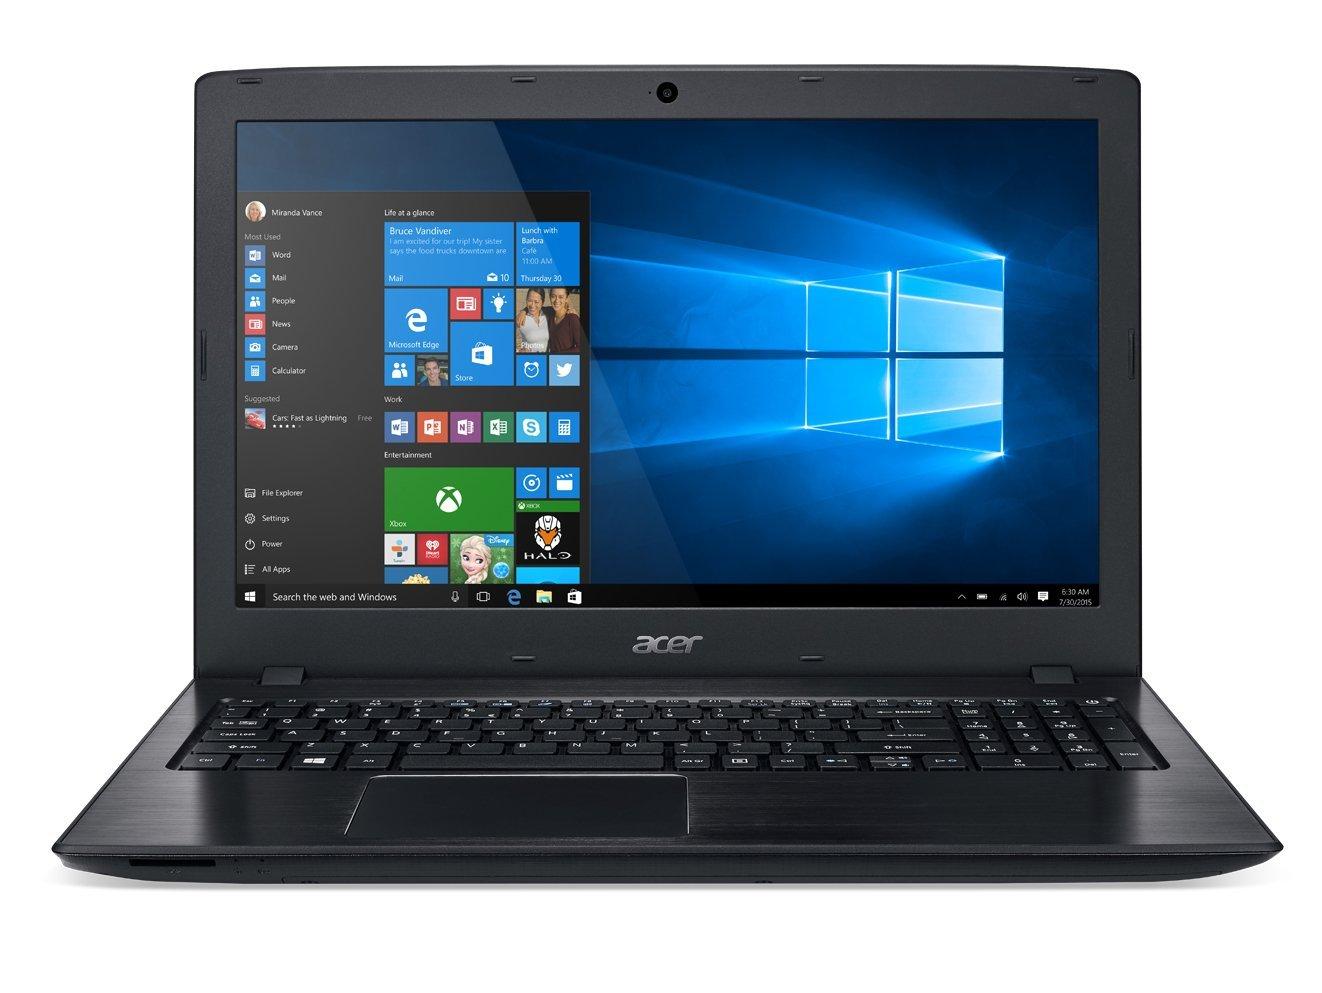 Acer Aspire E 15: 15.6'' FHD IPS, i5-8250U Quad, 8GB DDR4, 256GB SSD, MX150 2GB, DVD-RW, Type-C, WIn10H @ $599 + F/S